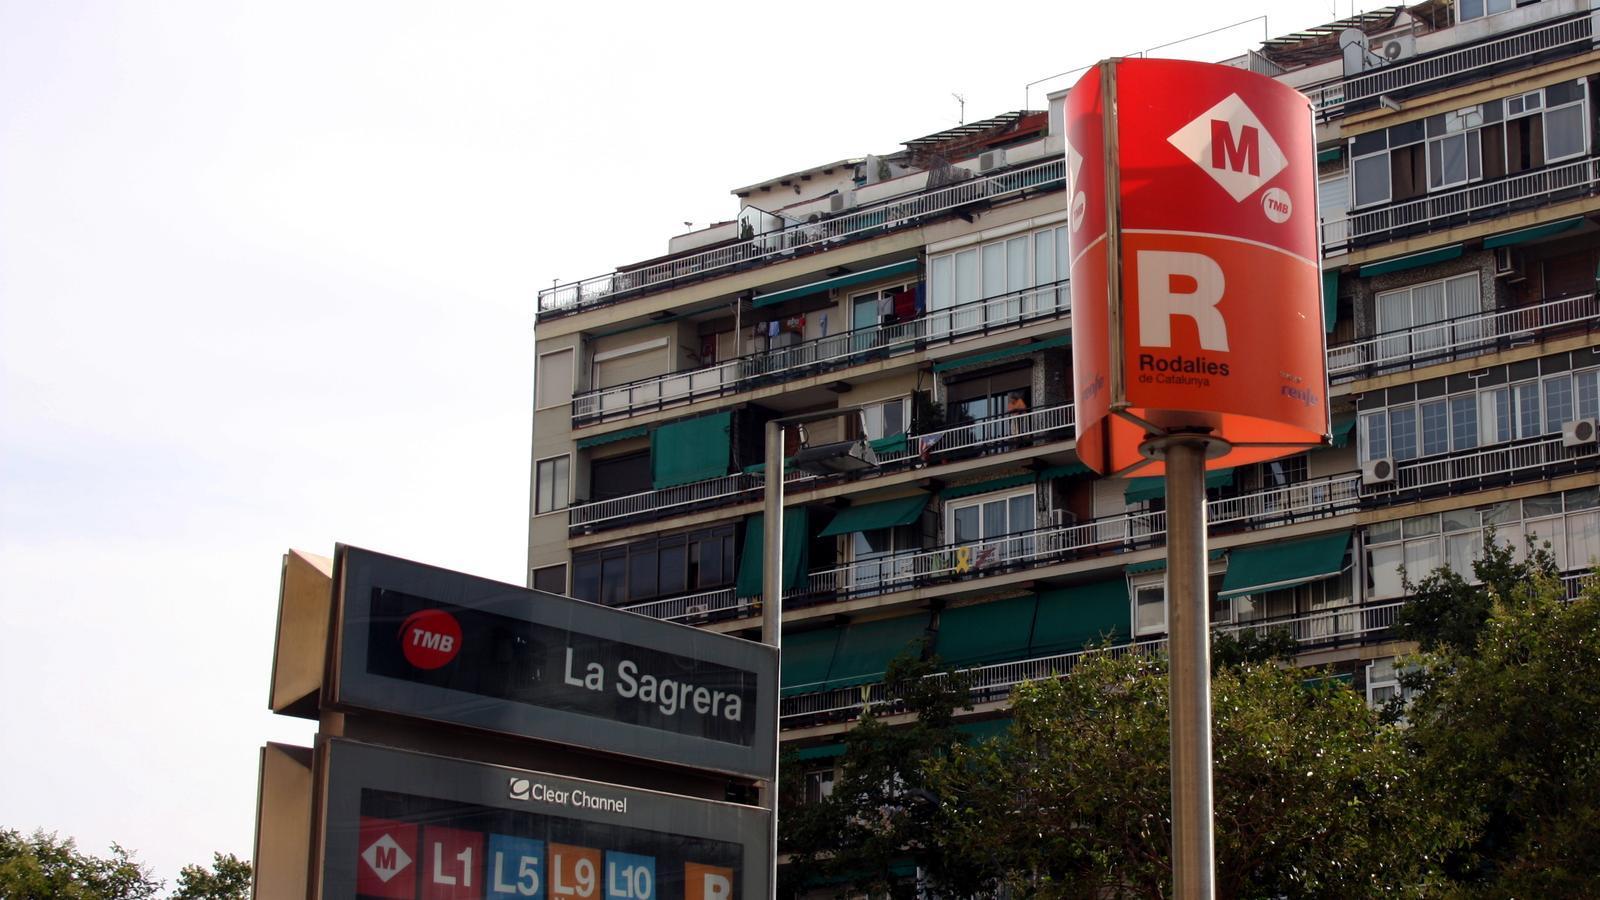 Agressió racista contra dos joves a la Sagrera